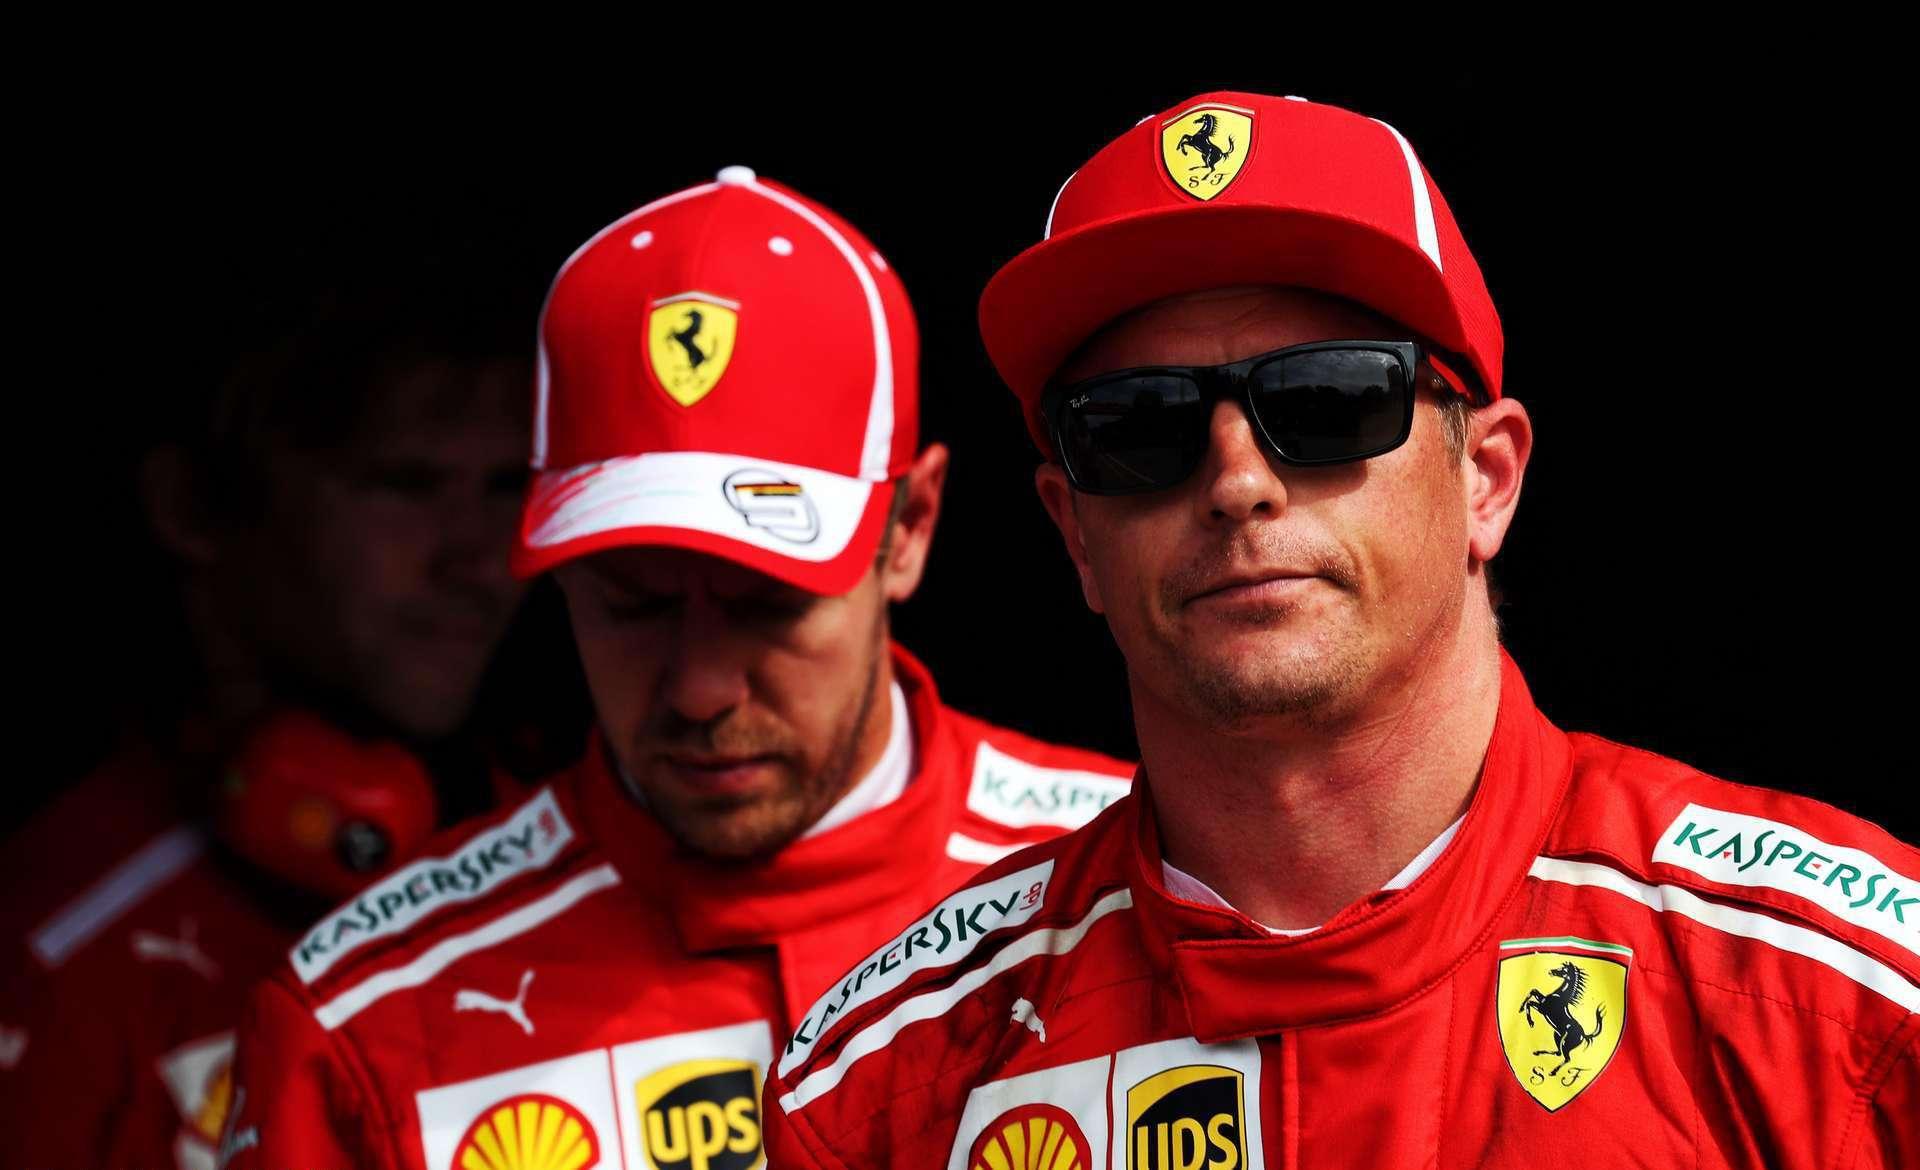 Raikkonen Vettel Ferrari Ferrari SF71H Italian GP F1 2018 post qualifying out of the car Photo Ferrari